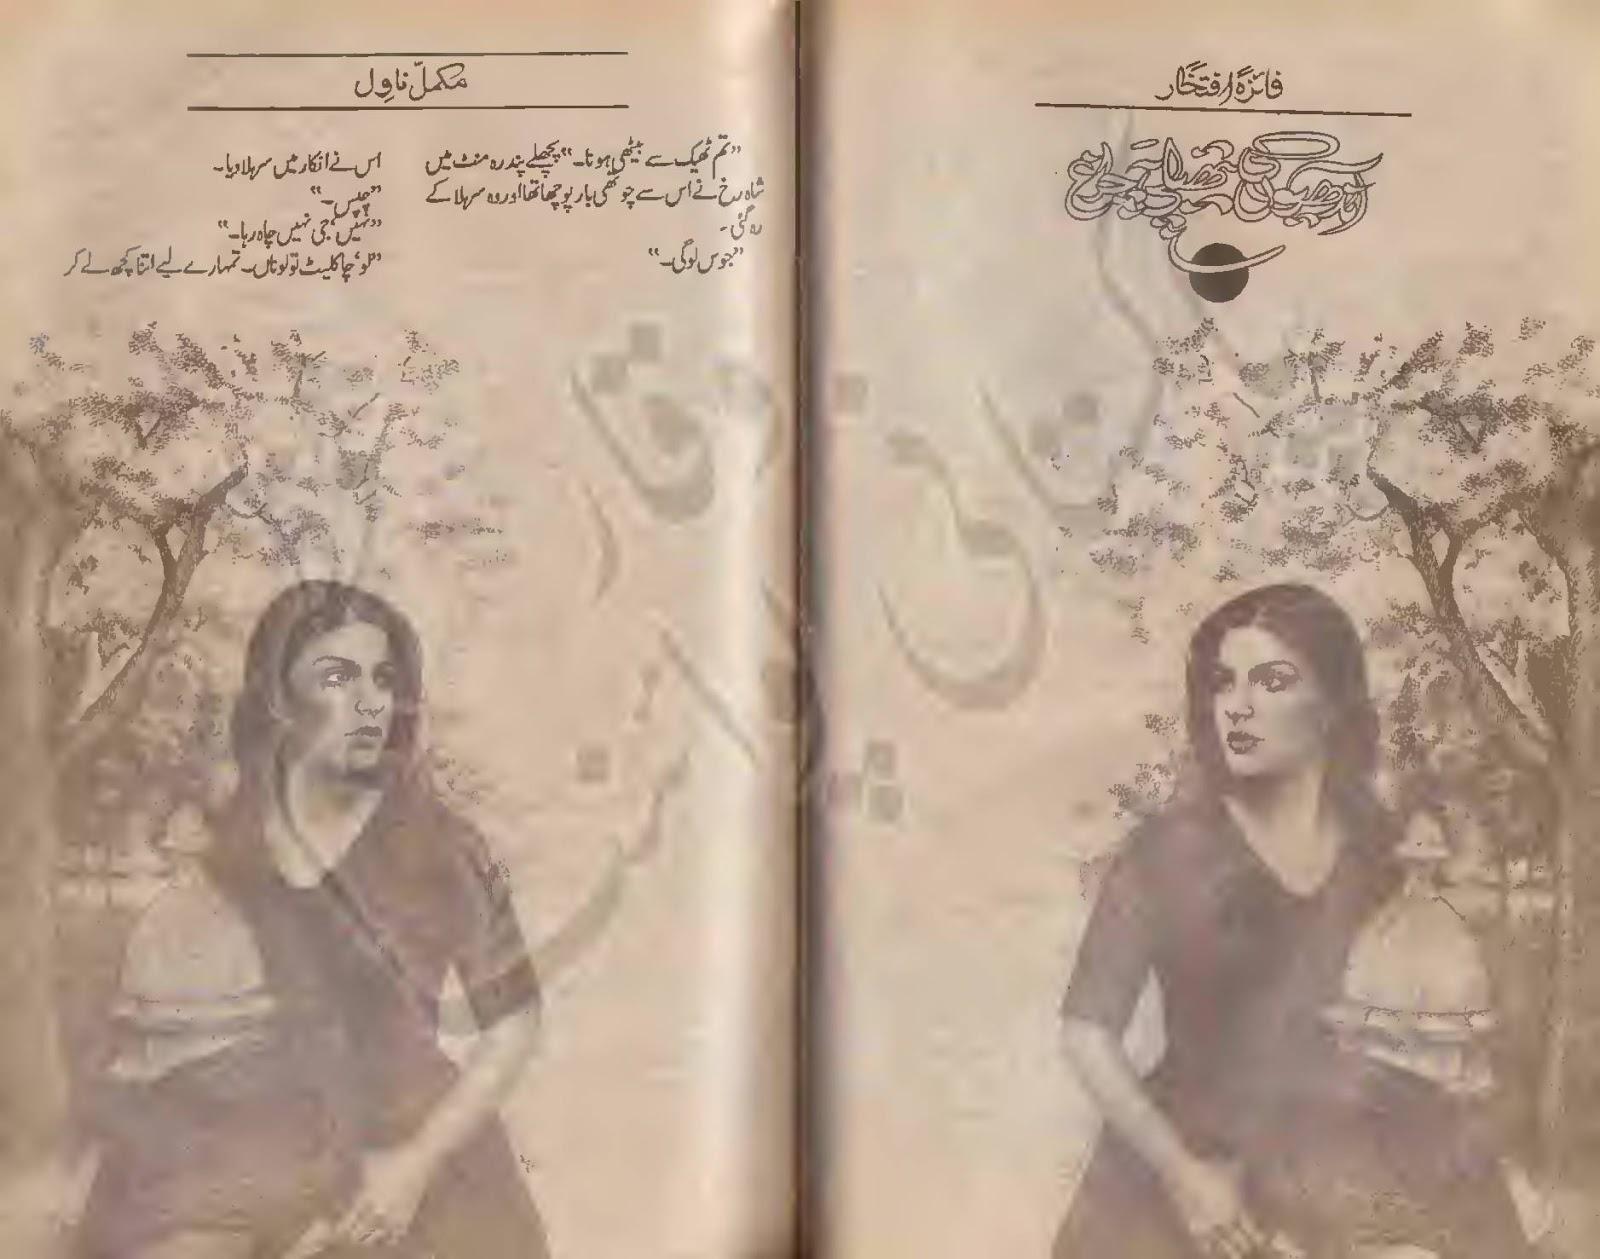 aandhion ki hatheli pe chiragh by faiza iftikhar2B252812529 - Aandhion Ki Hatheli Pe Chiragh by Faiza Iftikhar